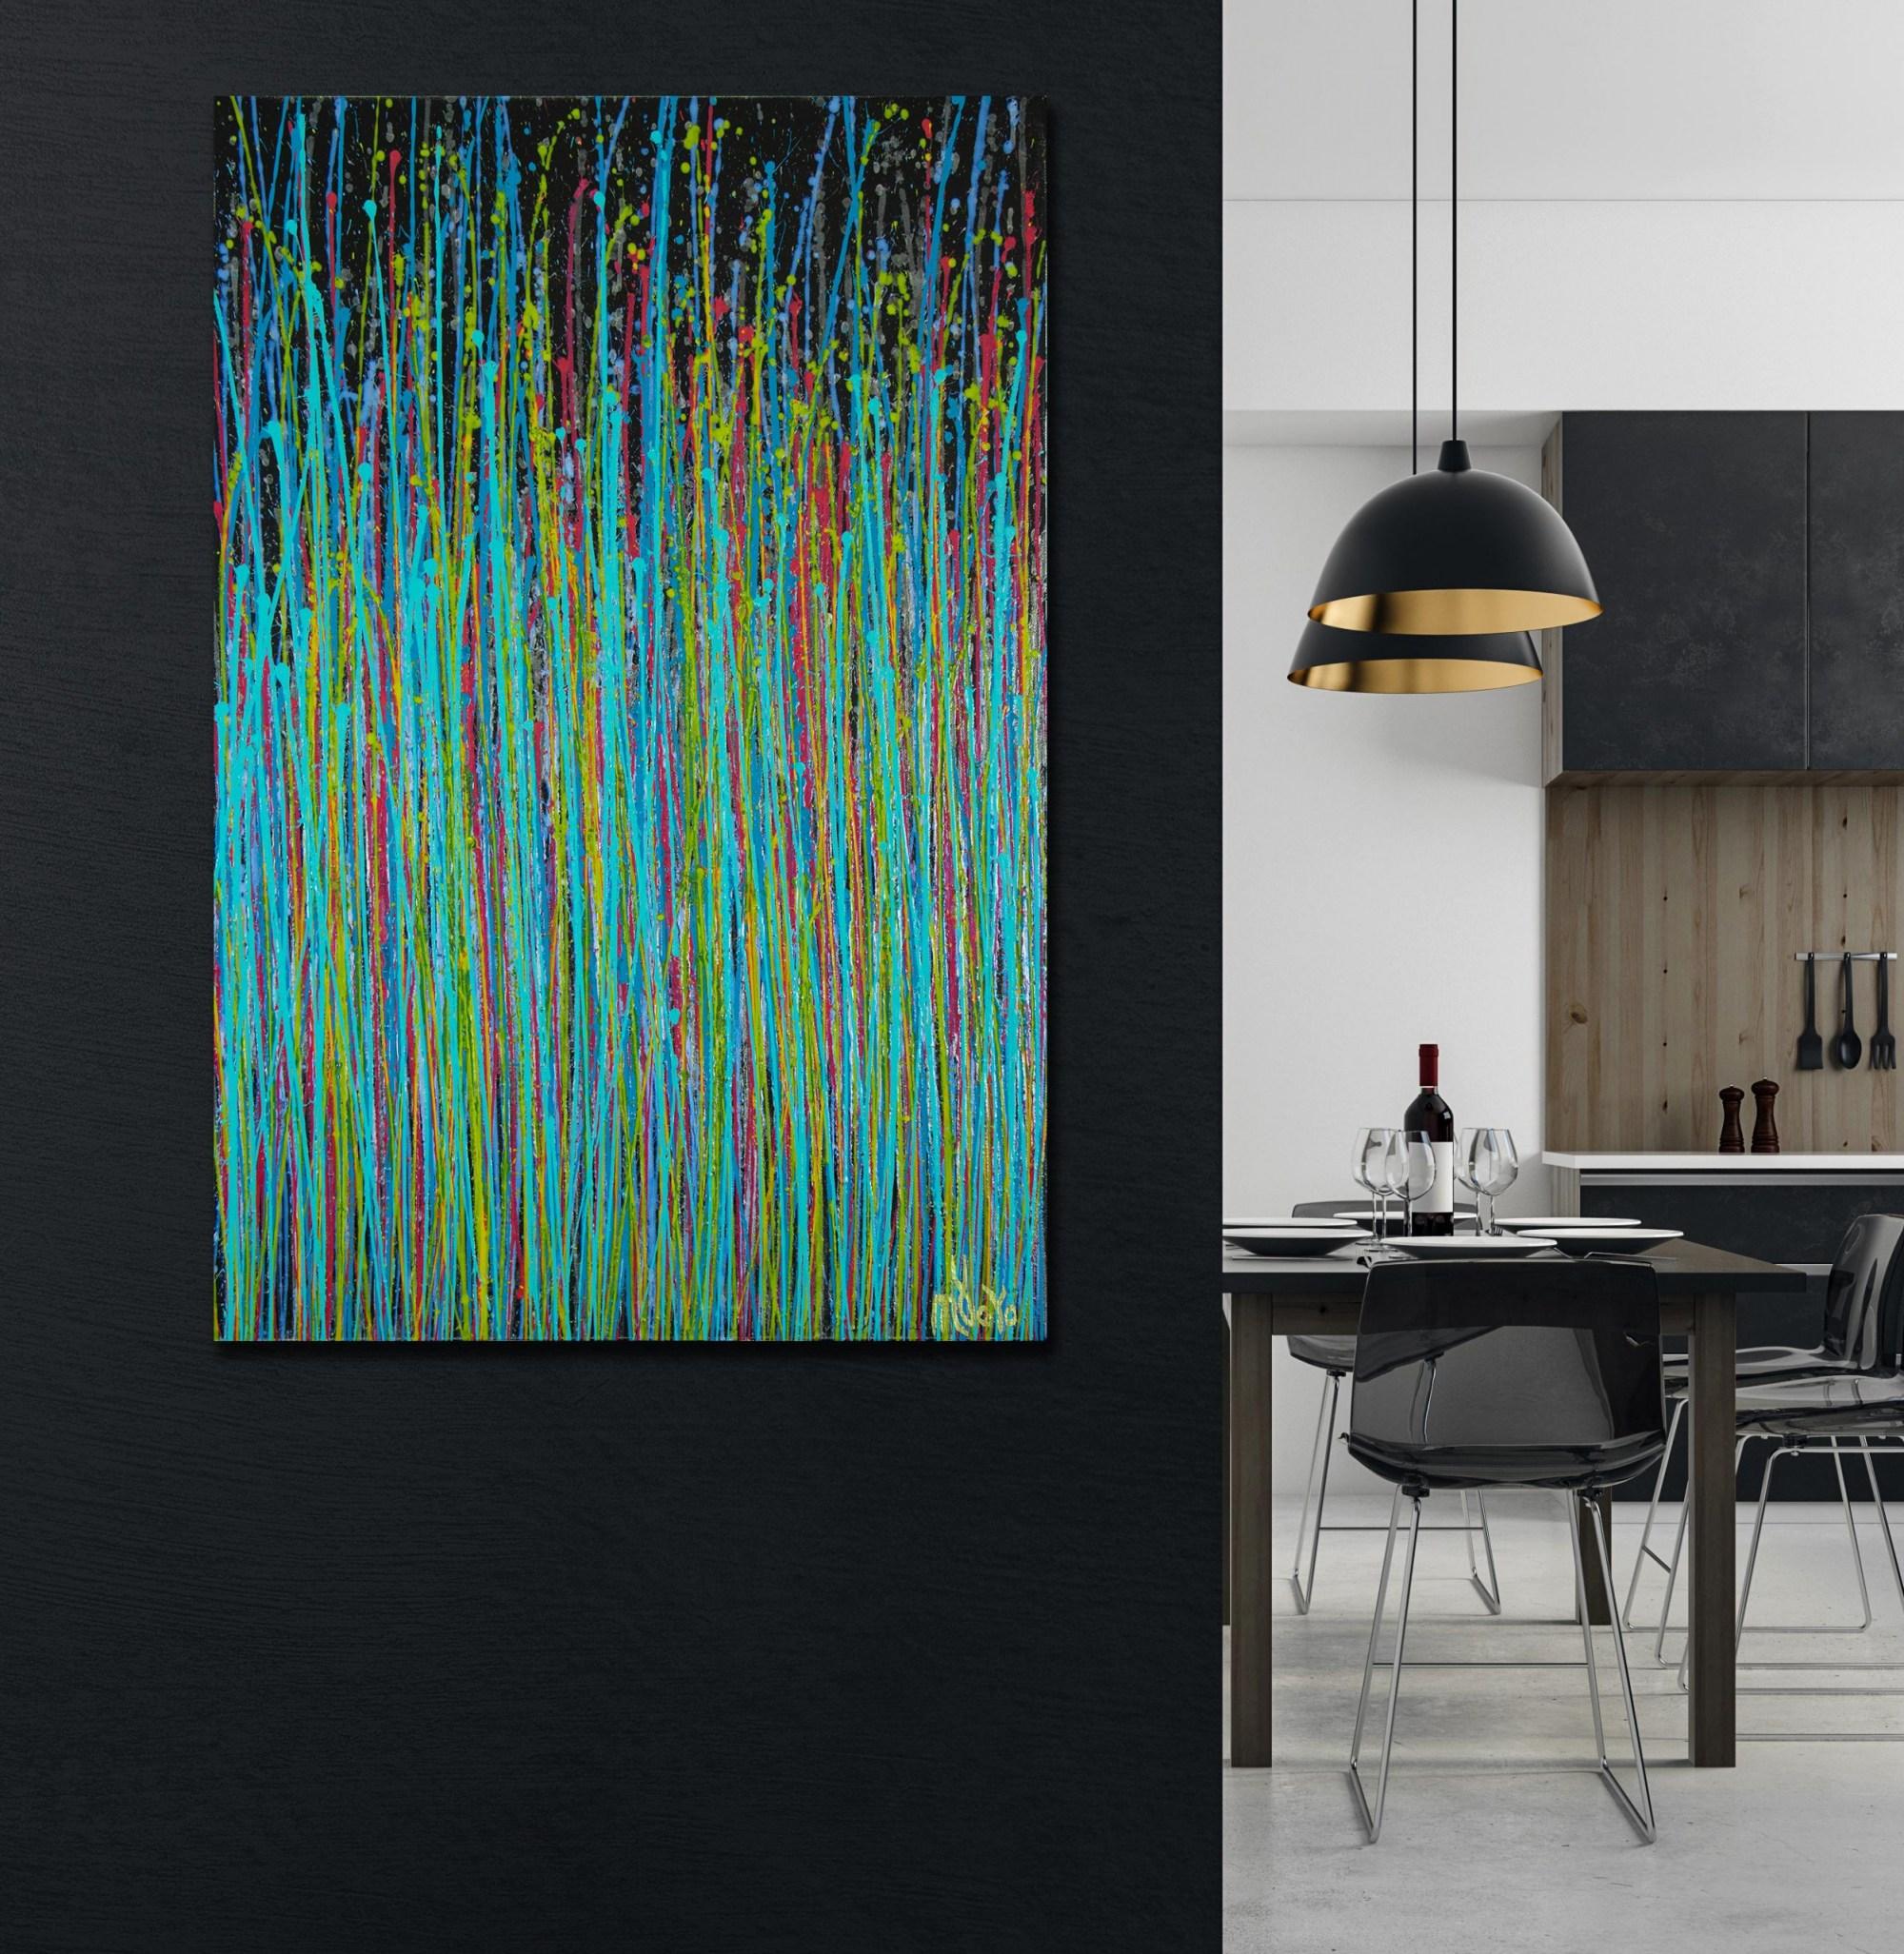 Room example / Blue Symphony (Natures Dance) 1 (2021) / 24X36 inches / Artist: Nestor Toro